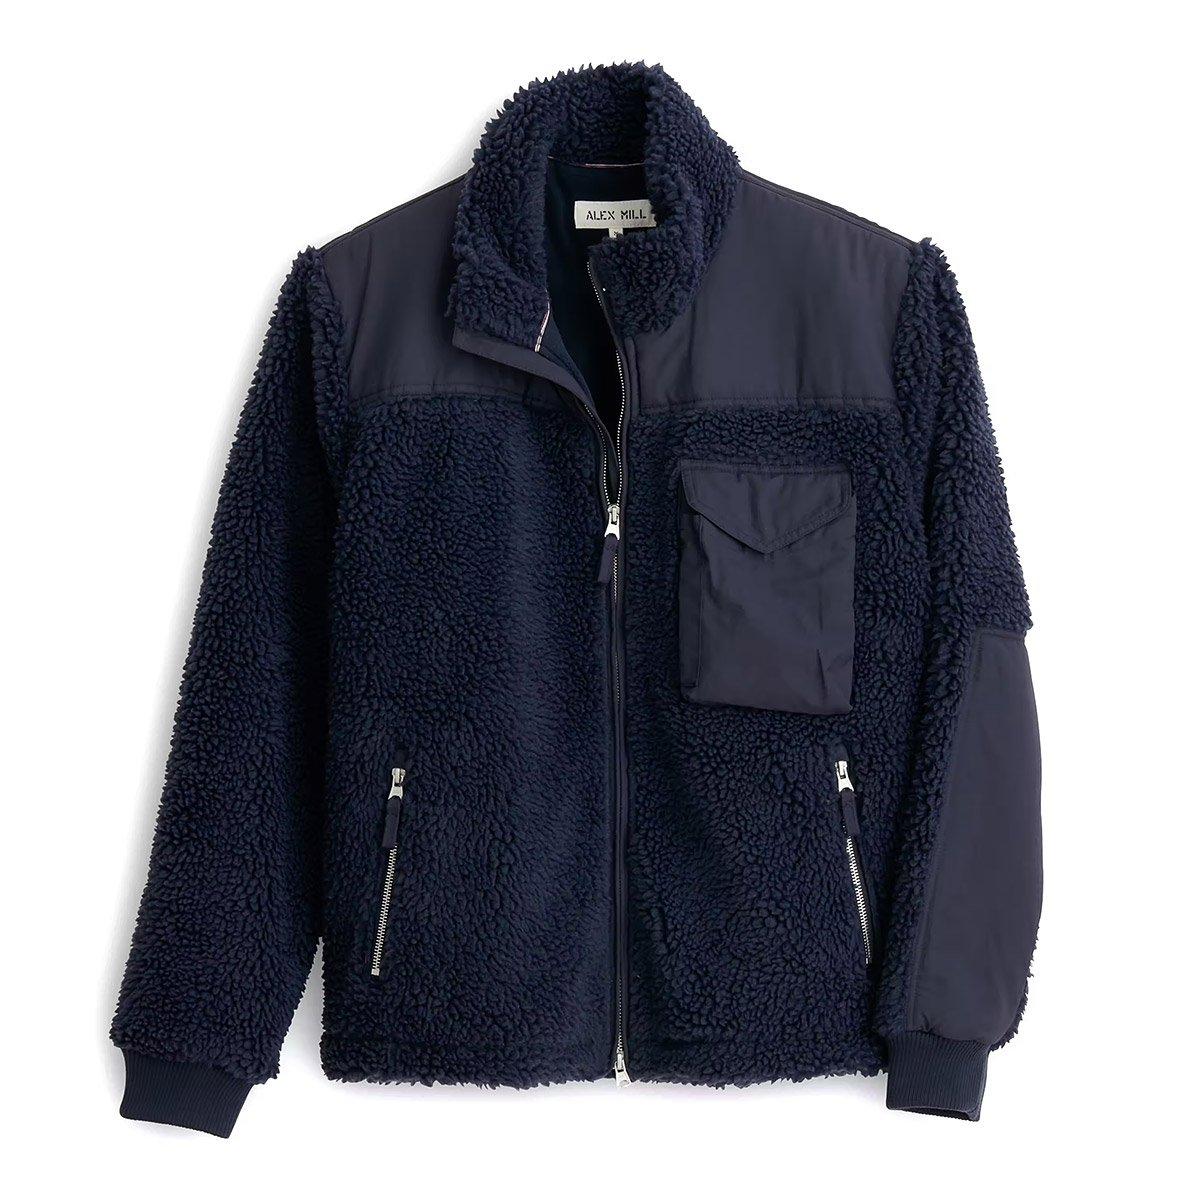 It's Fall: Get Fleece, Stay Warm at werd.com